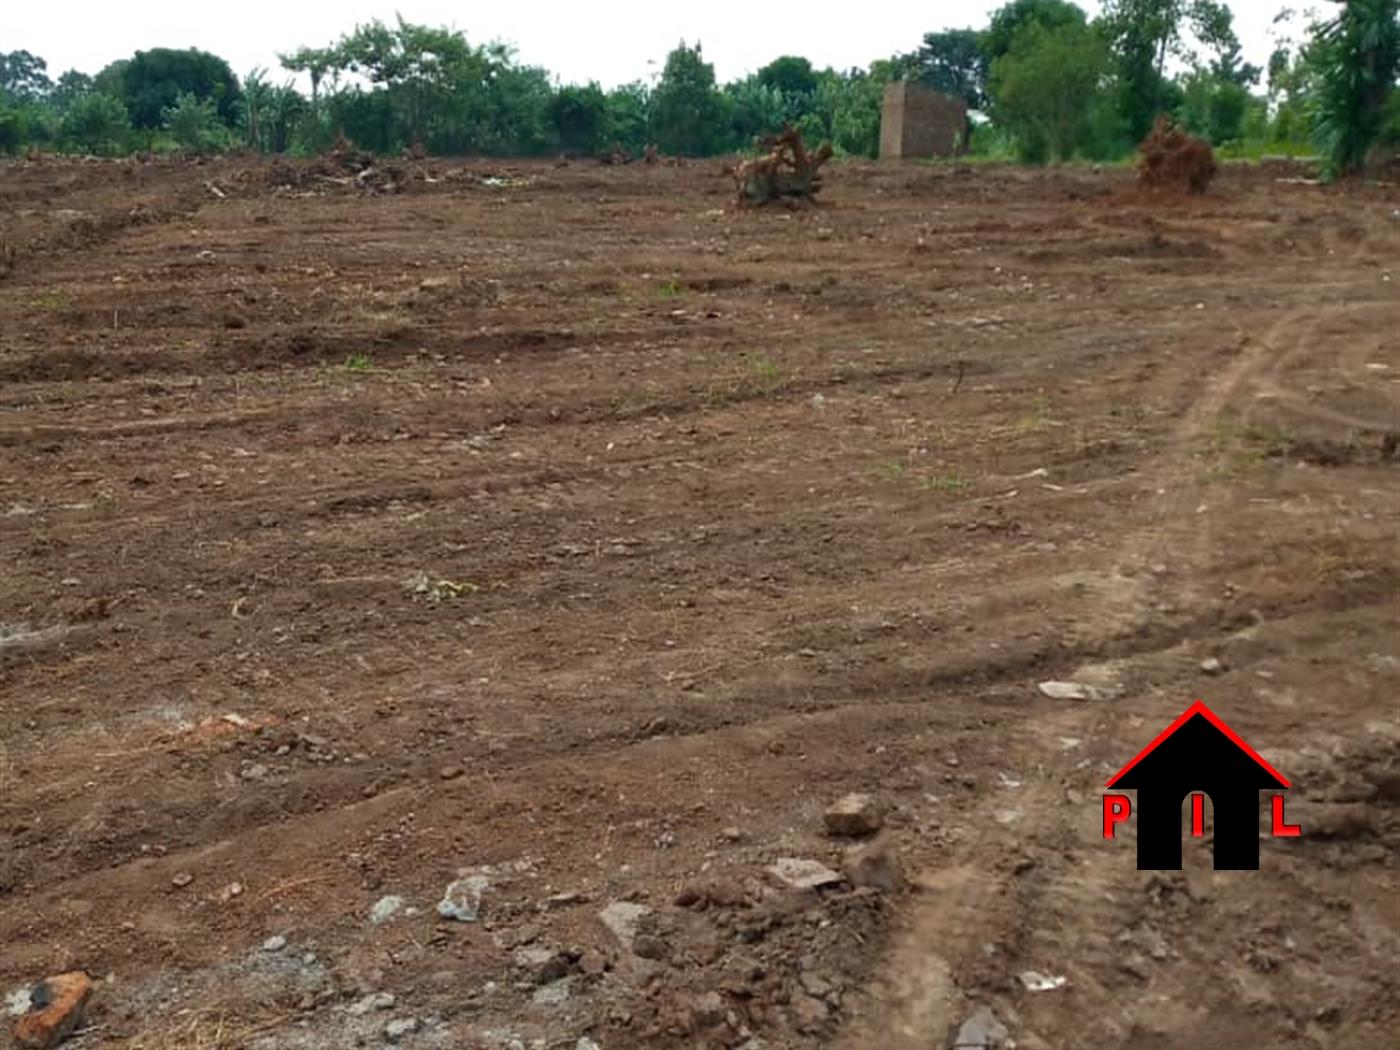 Residential Land for sale in Bukasa Mityana